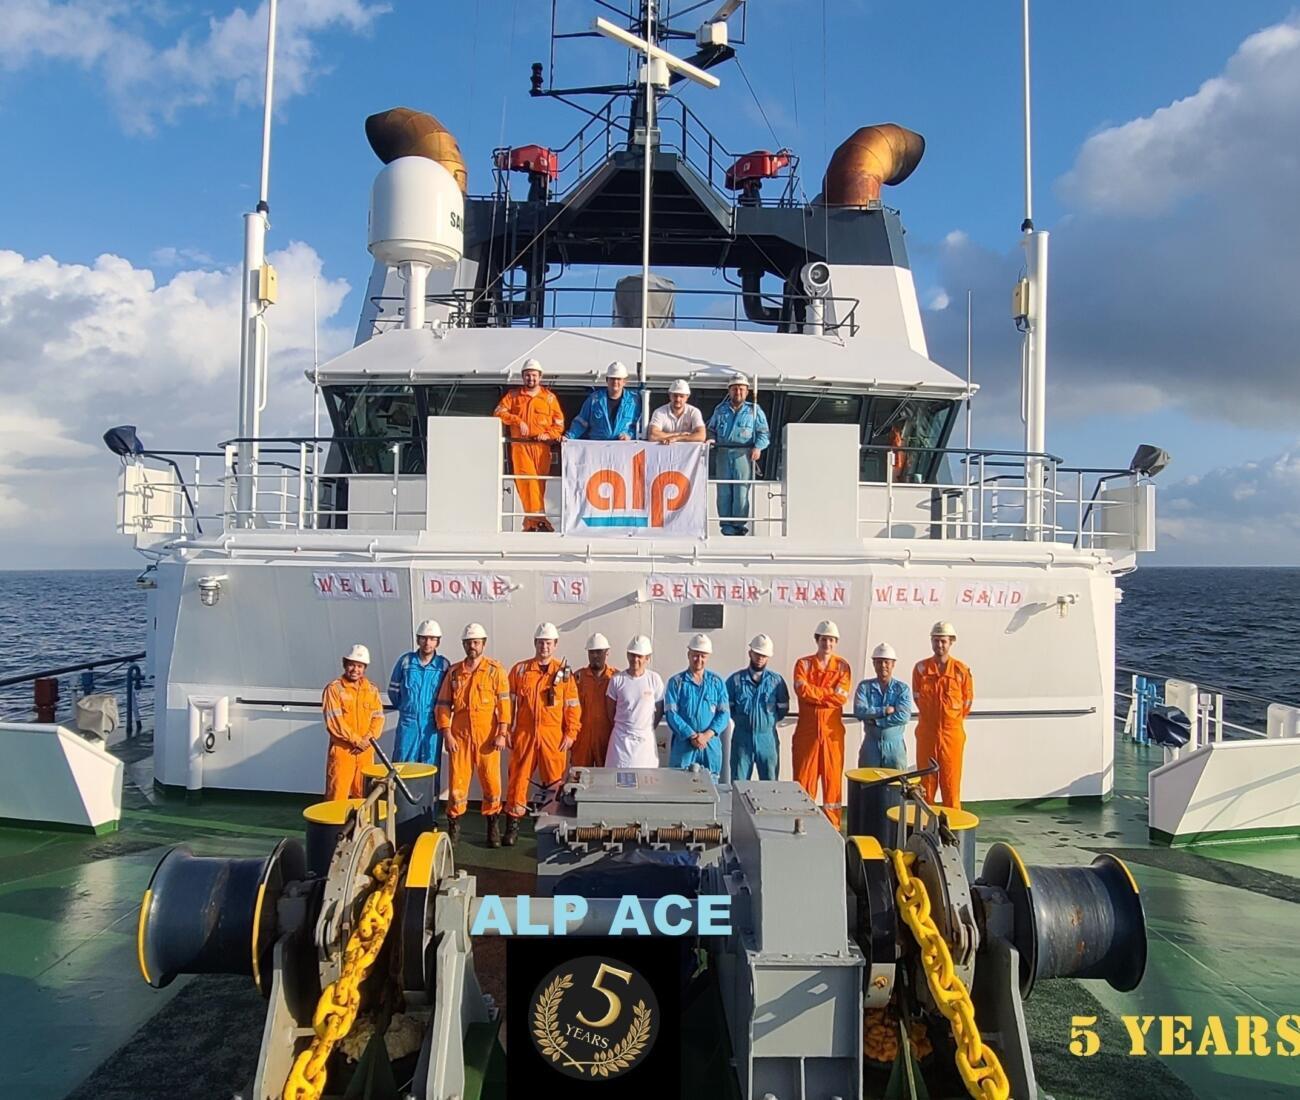 ALP-Ace-5-years-LTI-free.jpg